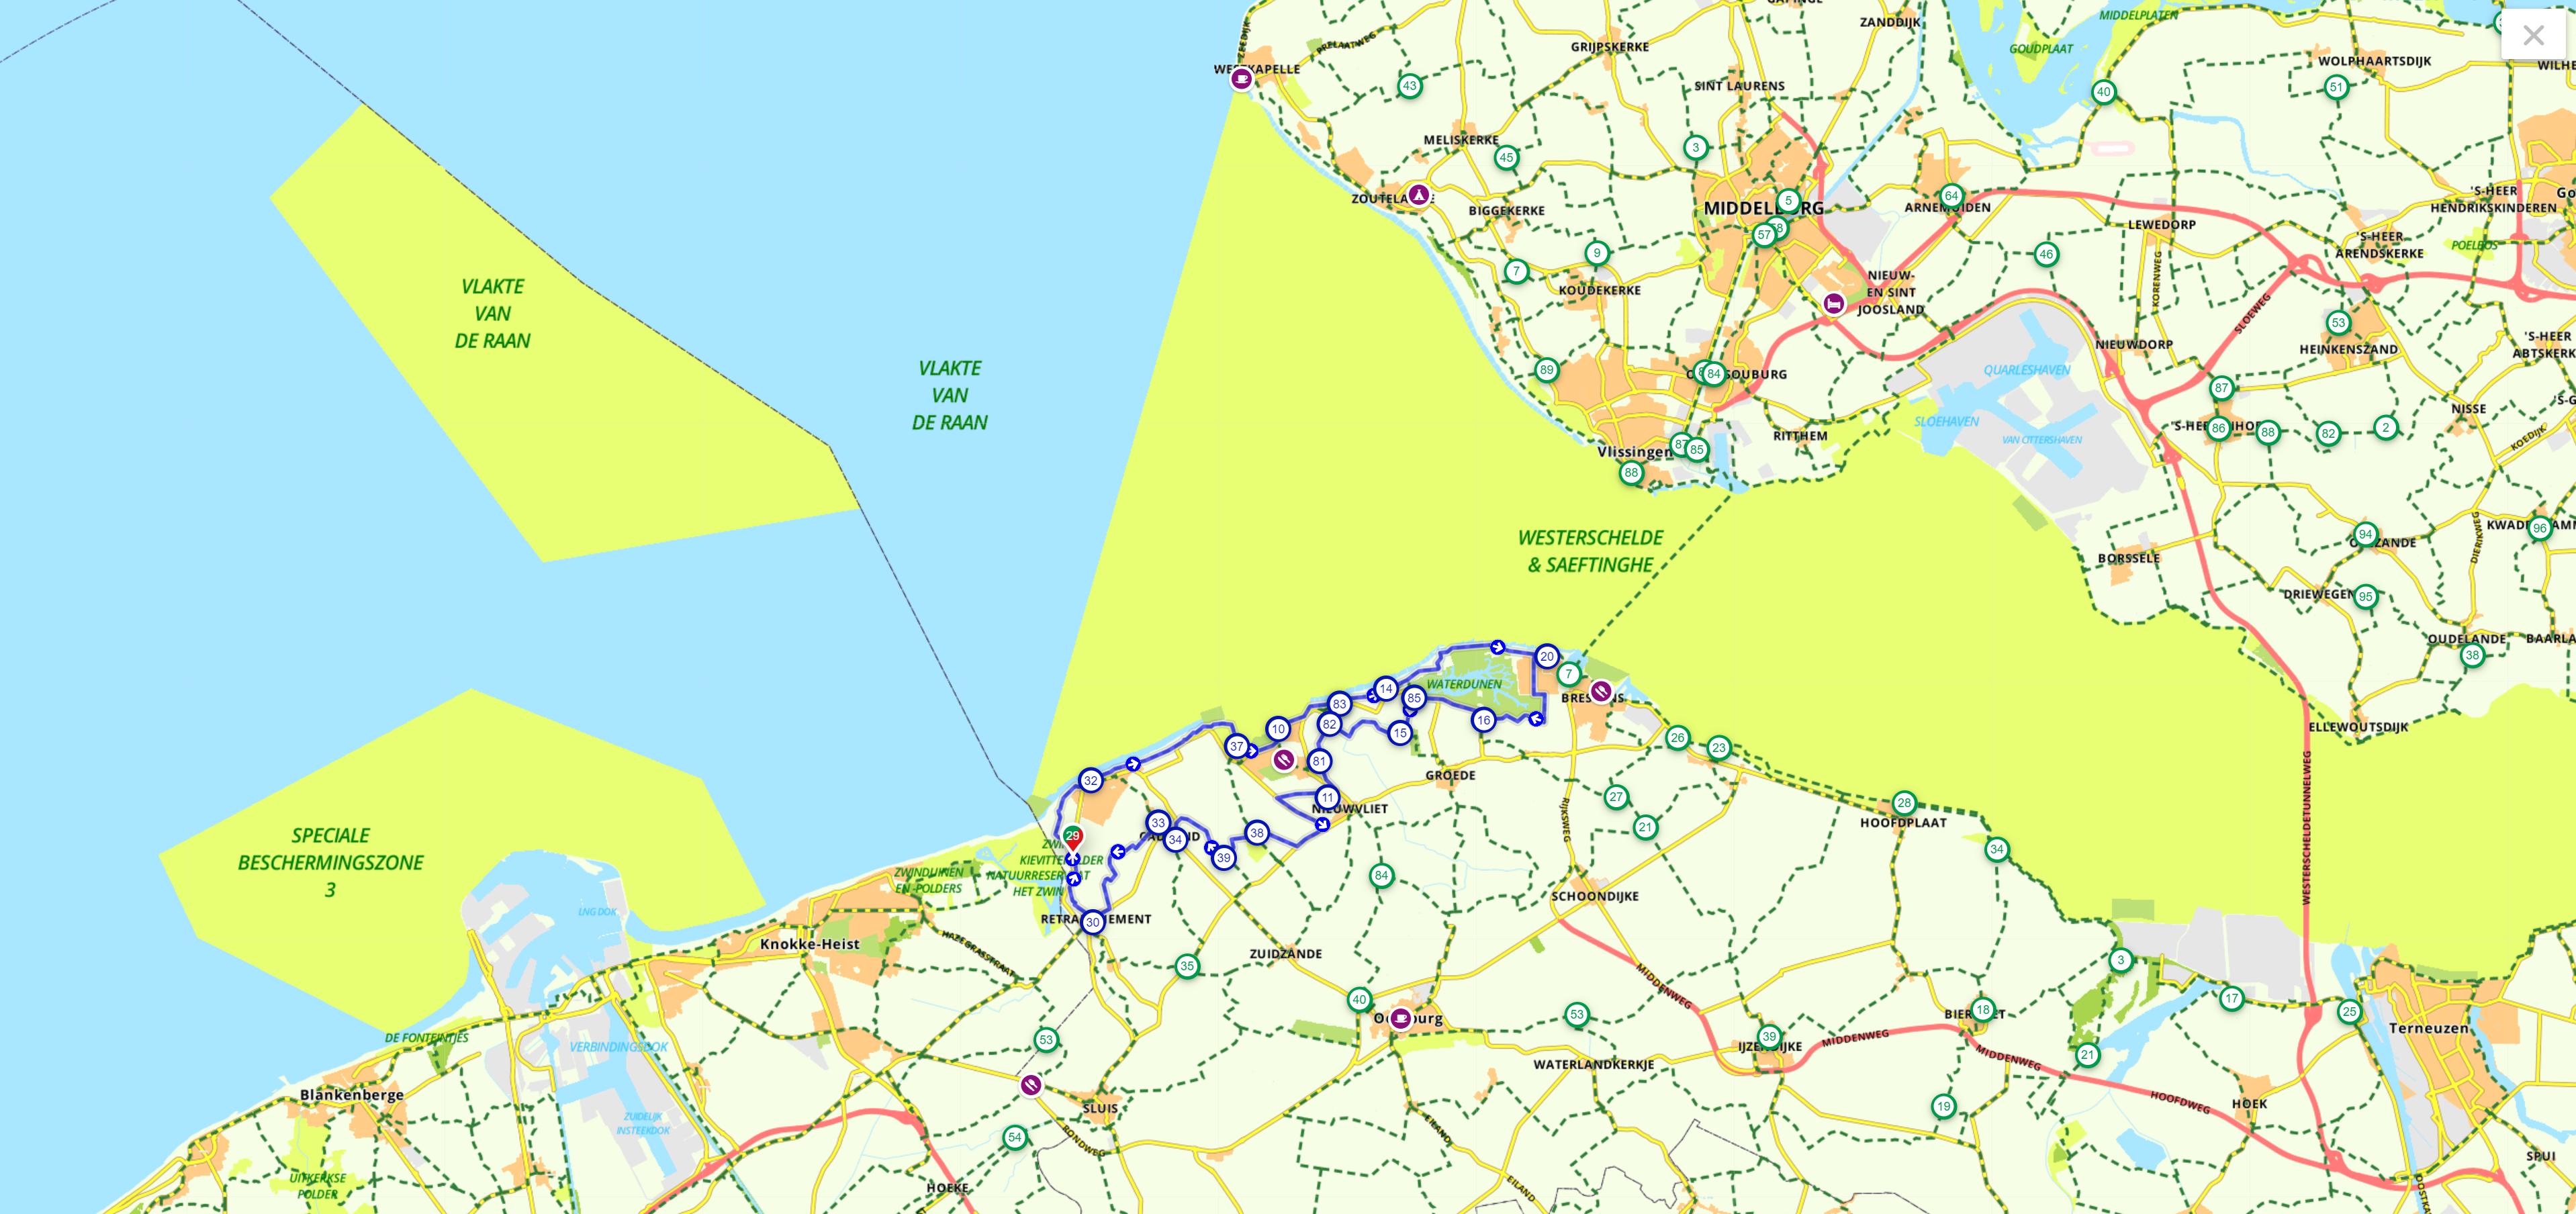 Panoramaroute fietsroute nederland